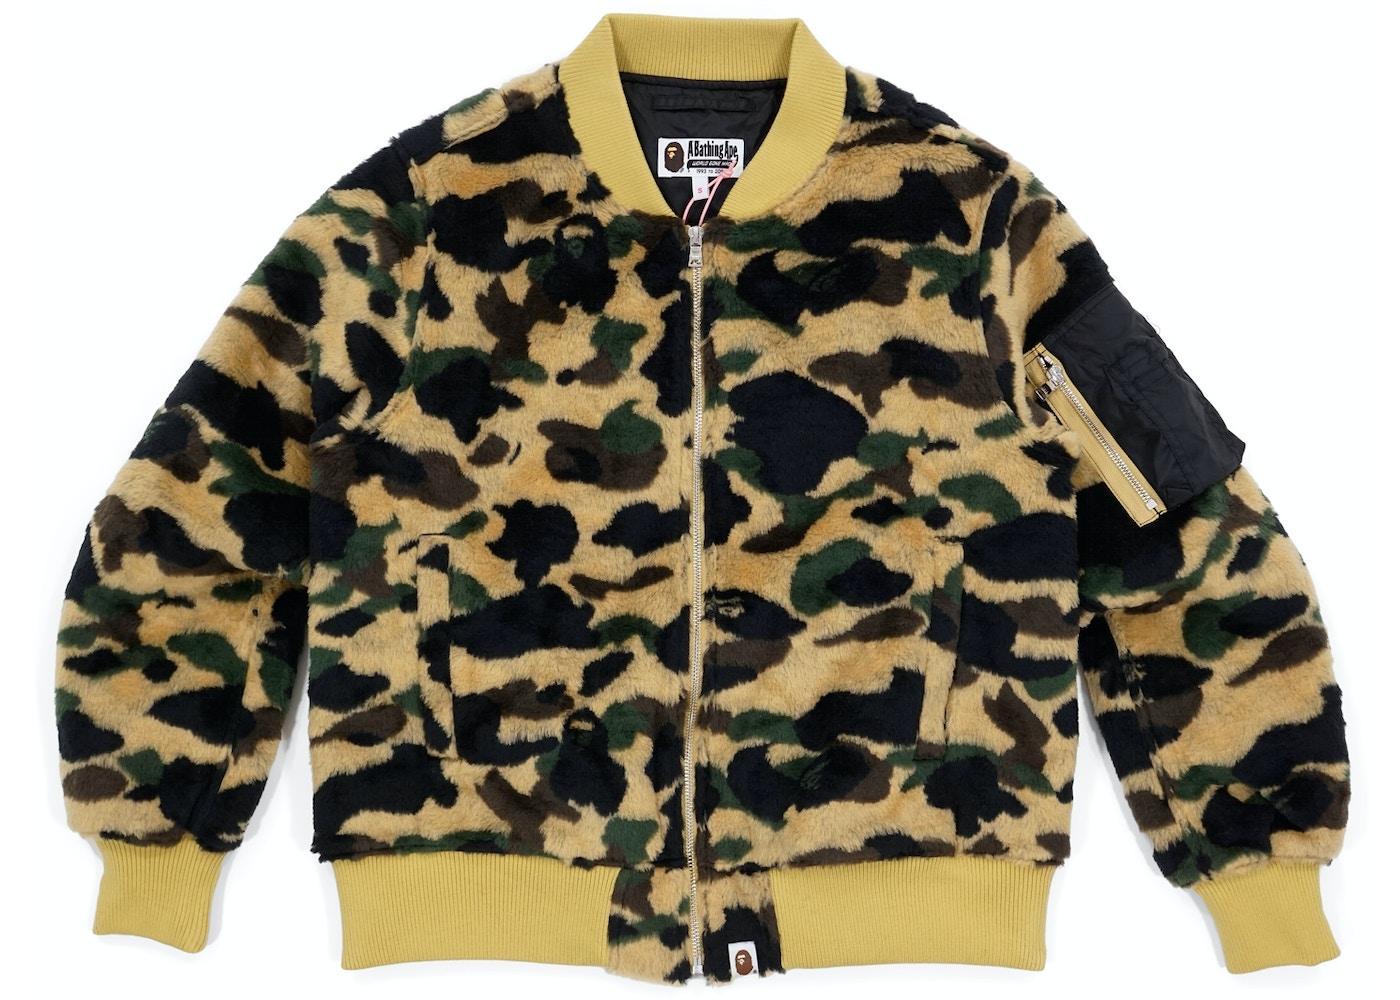 54796acfa4ae BAPE 1st Camo Boa Fur MA1 Bomber Flight Jacket (Ladies) Yellow -